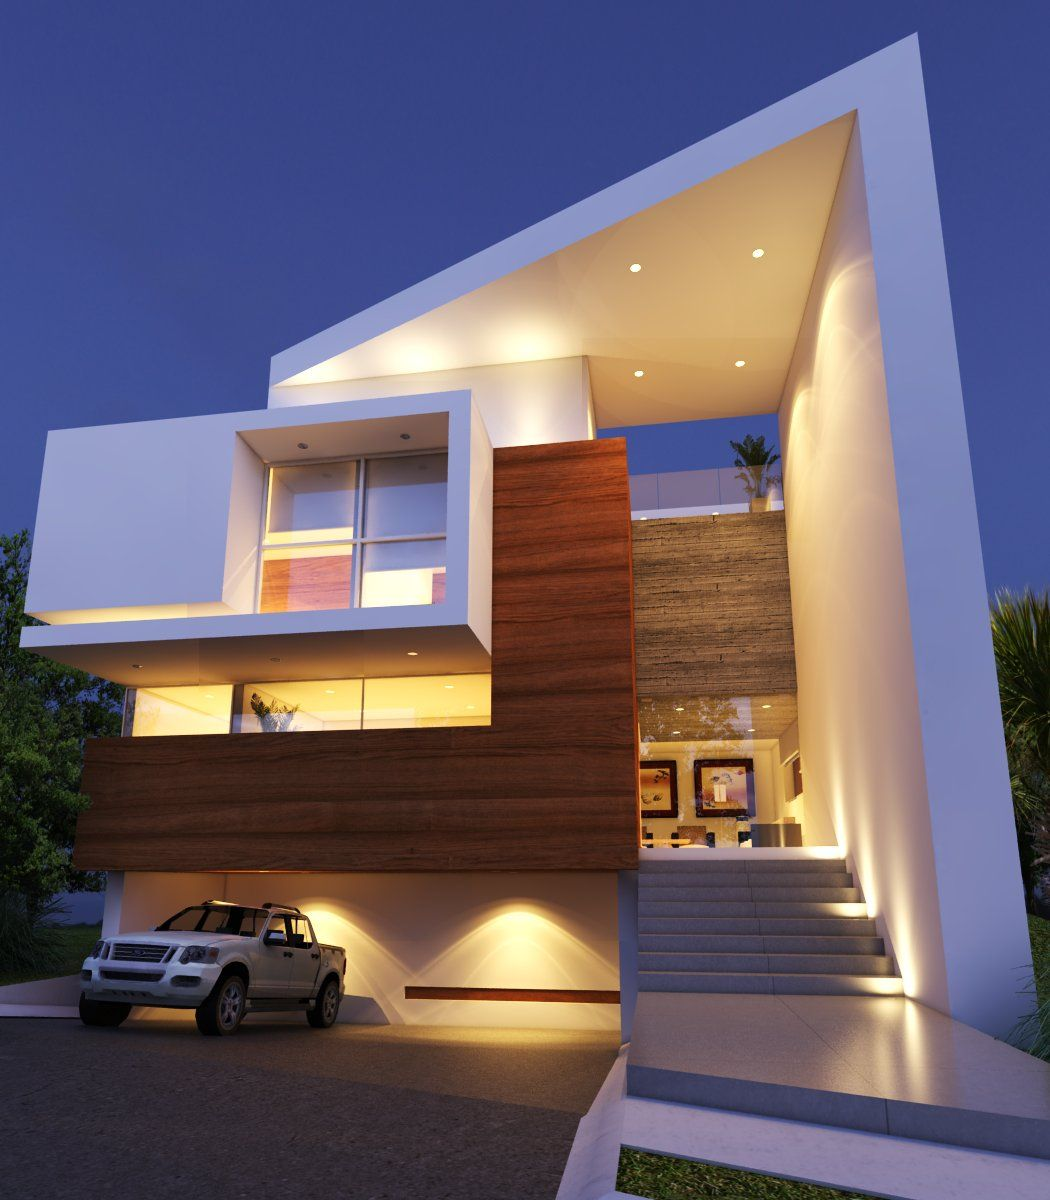 Casa del pilar residential architecture pinterest for Las casas modernas